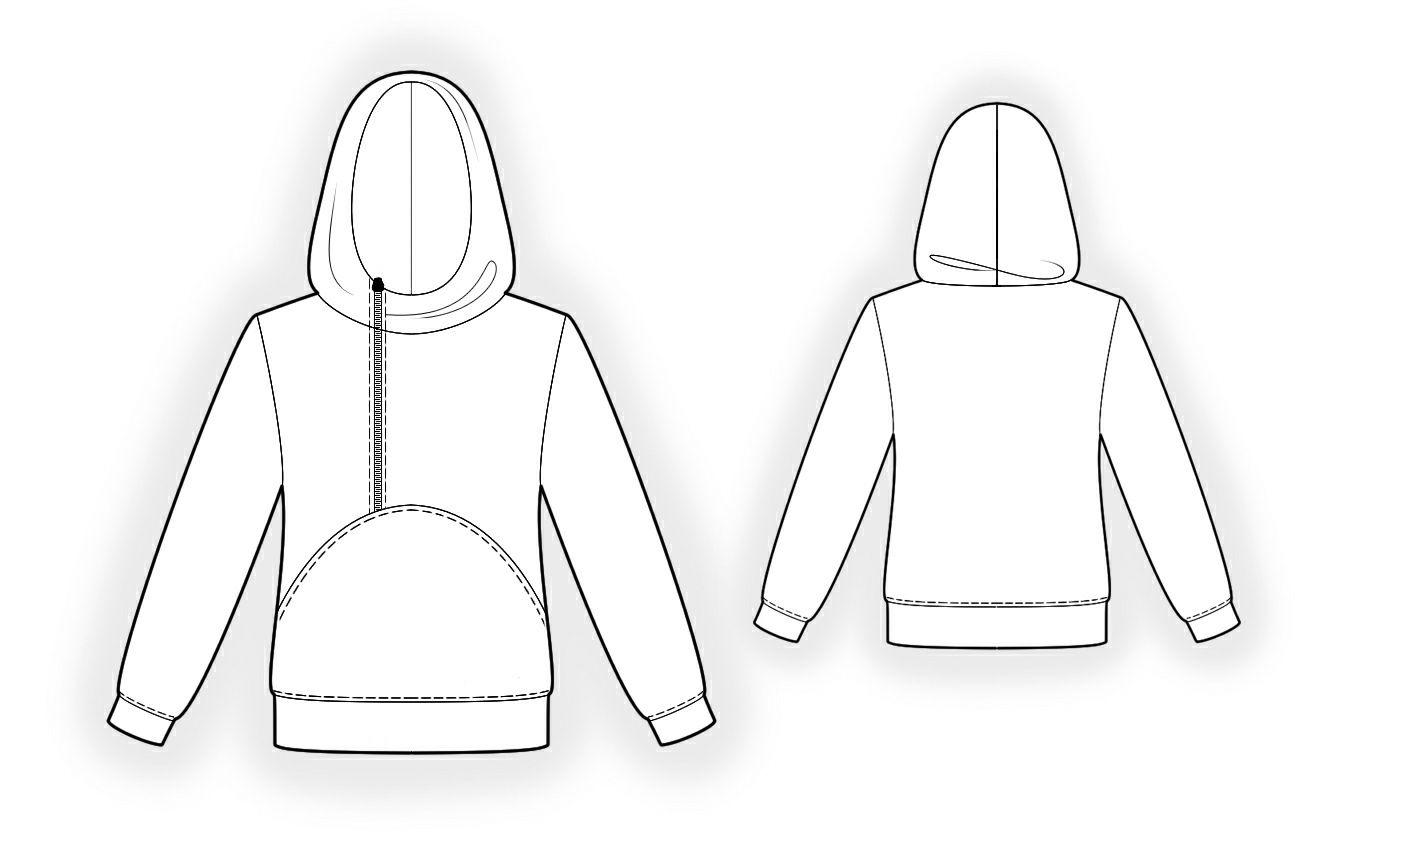 Sudadera - Patrón de costura #4341. Made-to-measure sewing pattern ...